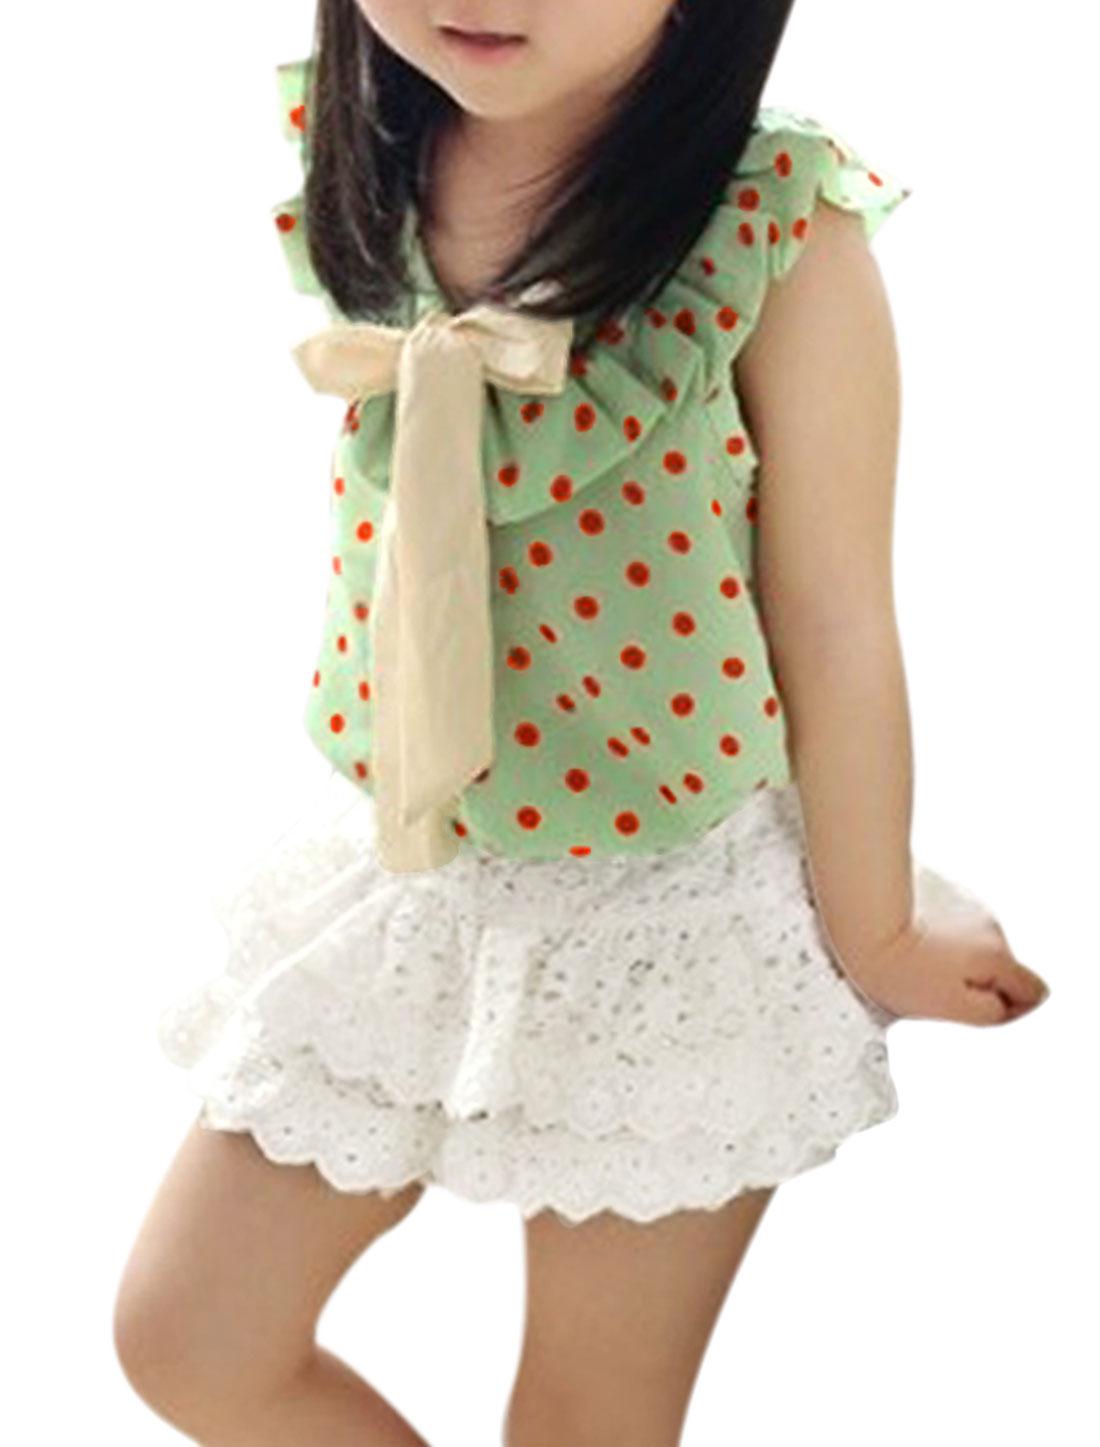 Kids Girls Sleeveless Strap Dots Pattern Blouse w Stretchy Waist Skort Light Green White US Size 4